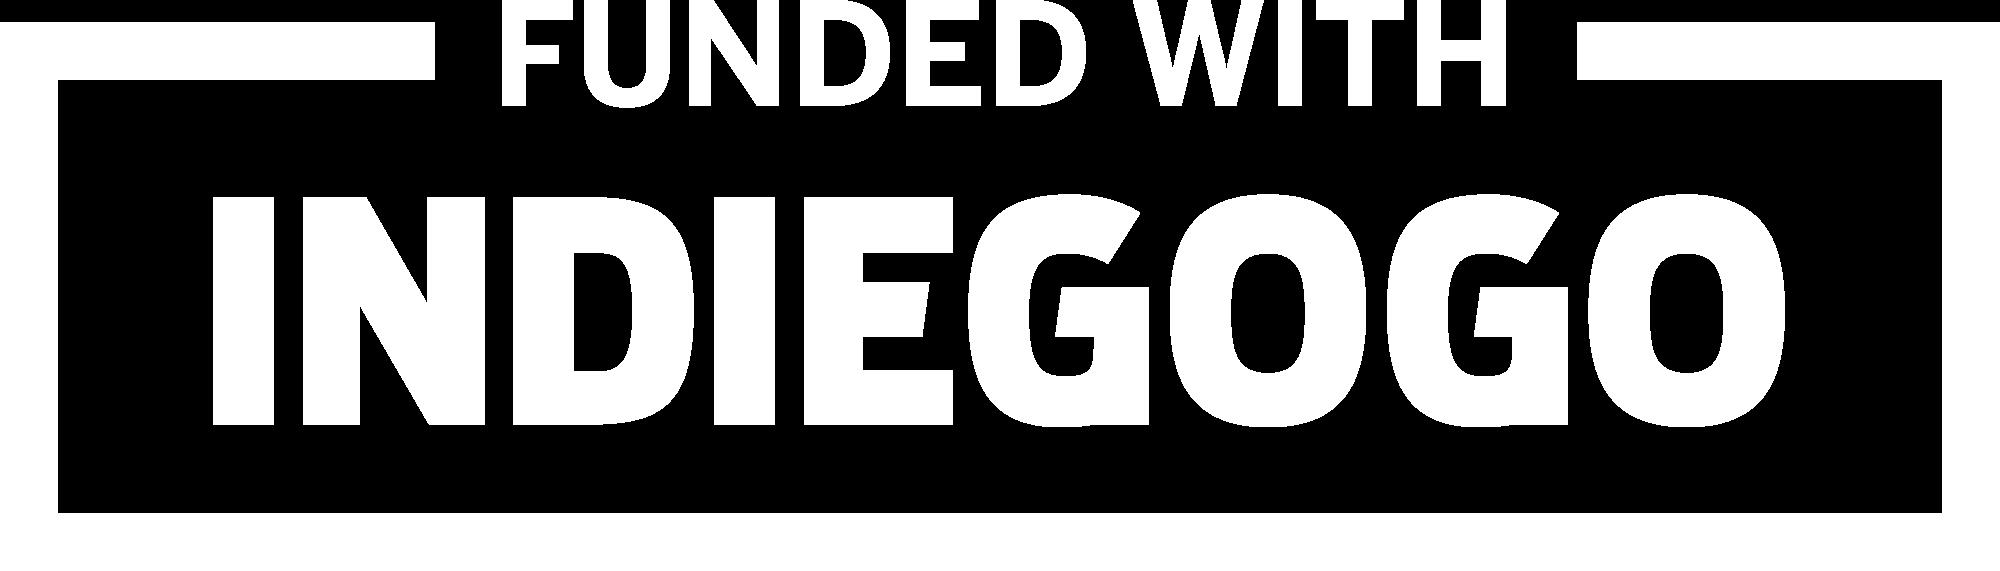 Igg fundedwithbadges whiteoutlined rgb rectangle fecfbc85437c9380192ee2391f2e85f0a201b8a2caa678482e6eec615091320e